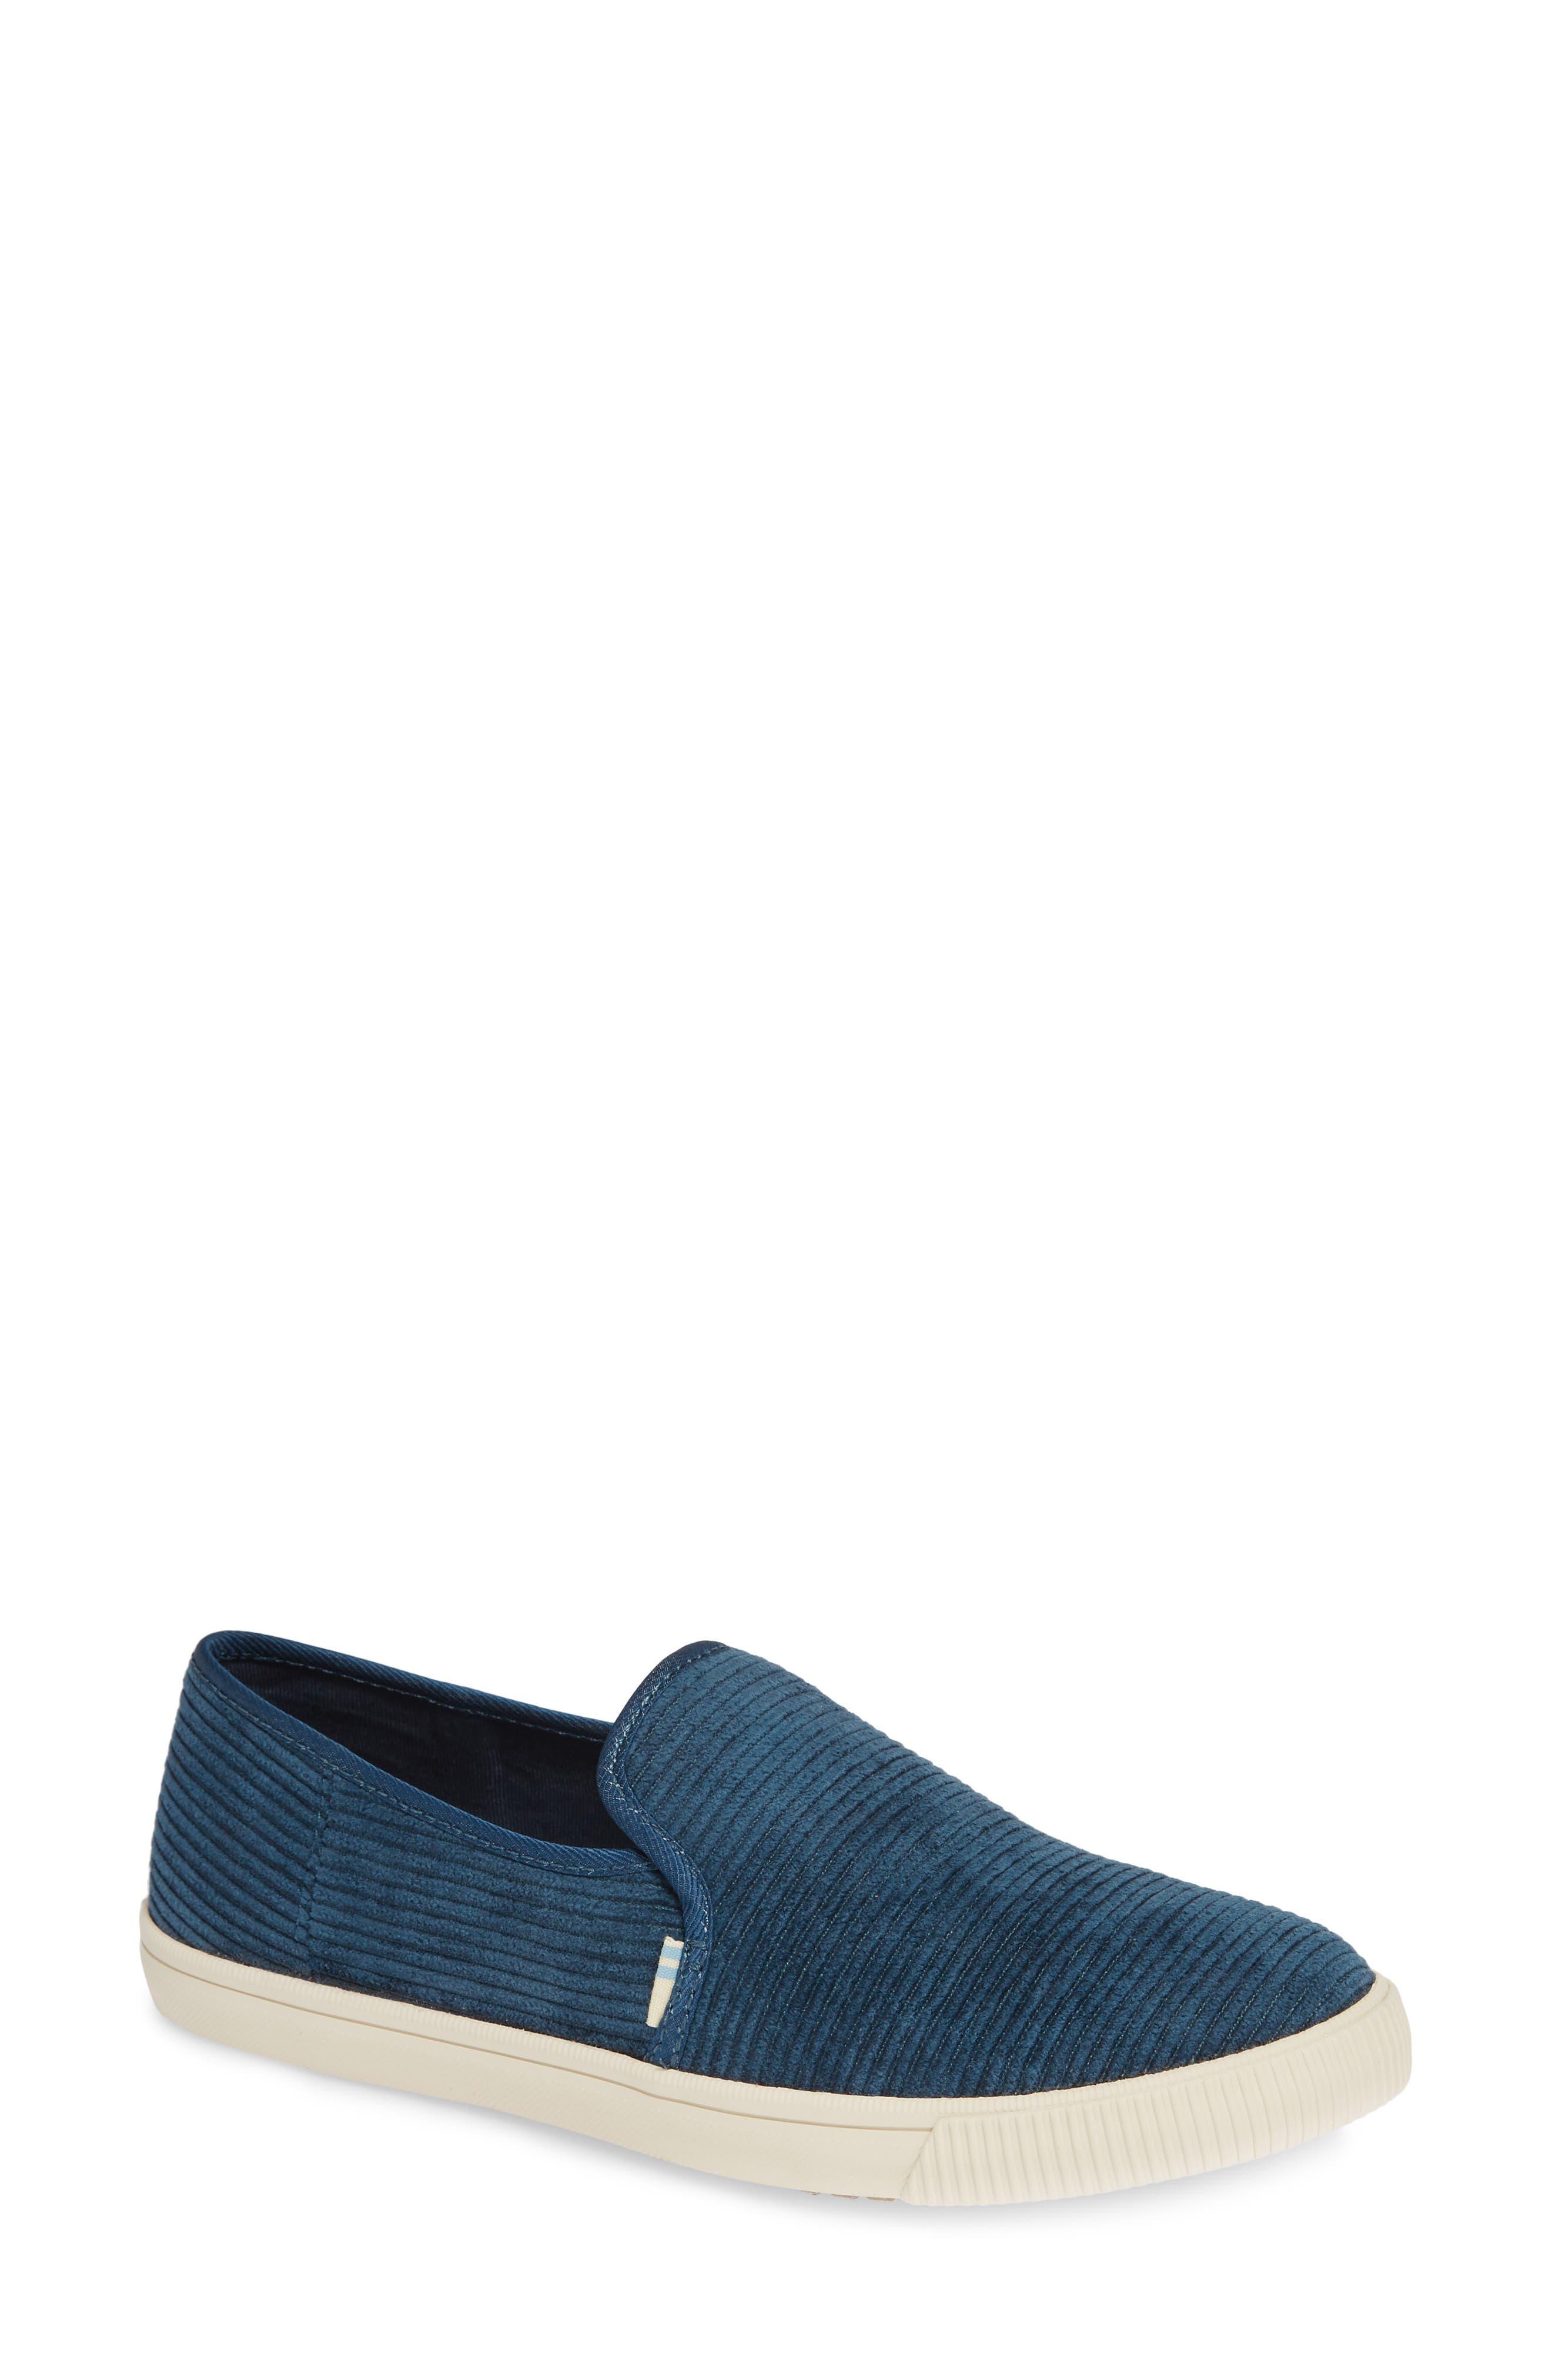 Clemente Slip-On,                         Main,                         color, ATLANTIC CORDUROY FABRIC